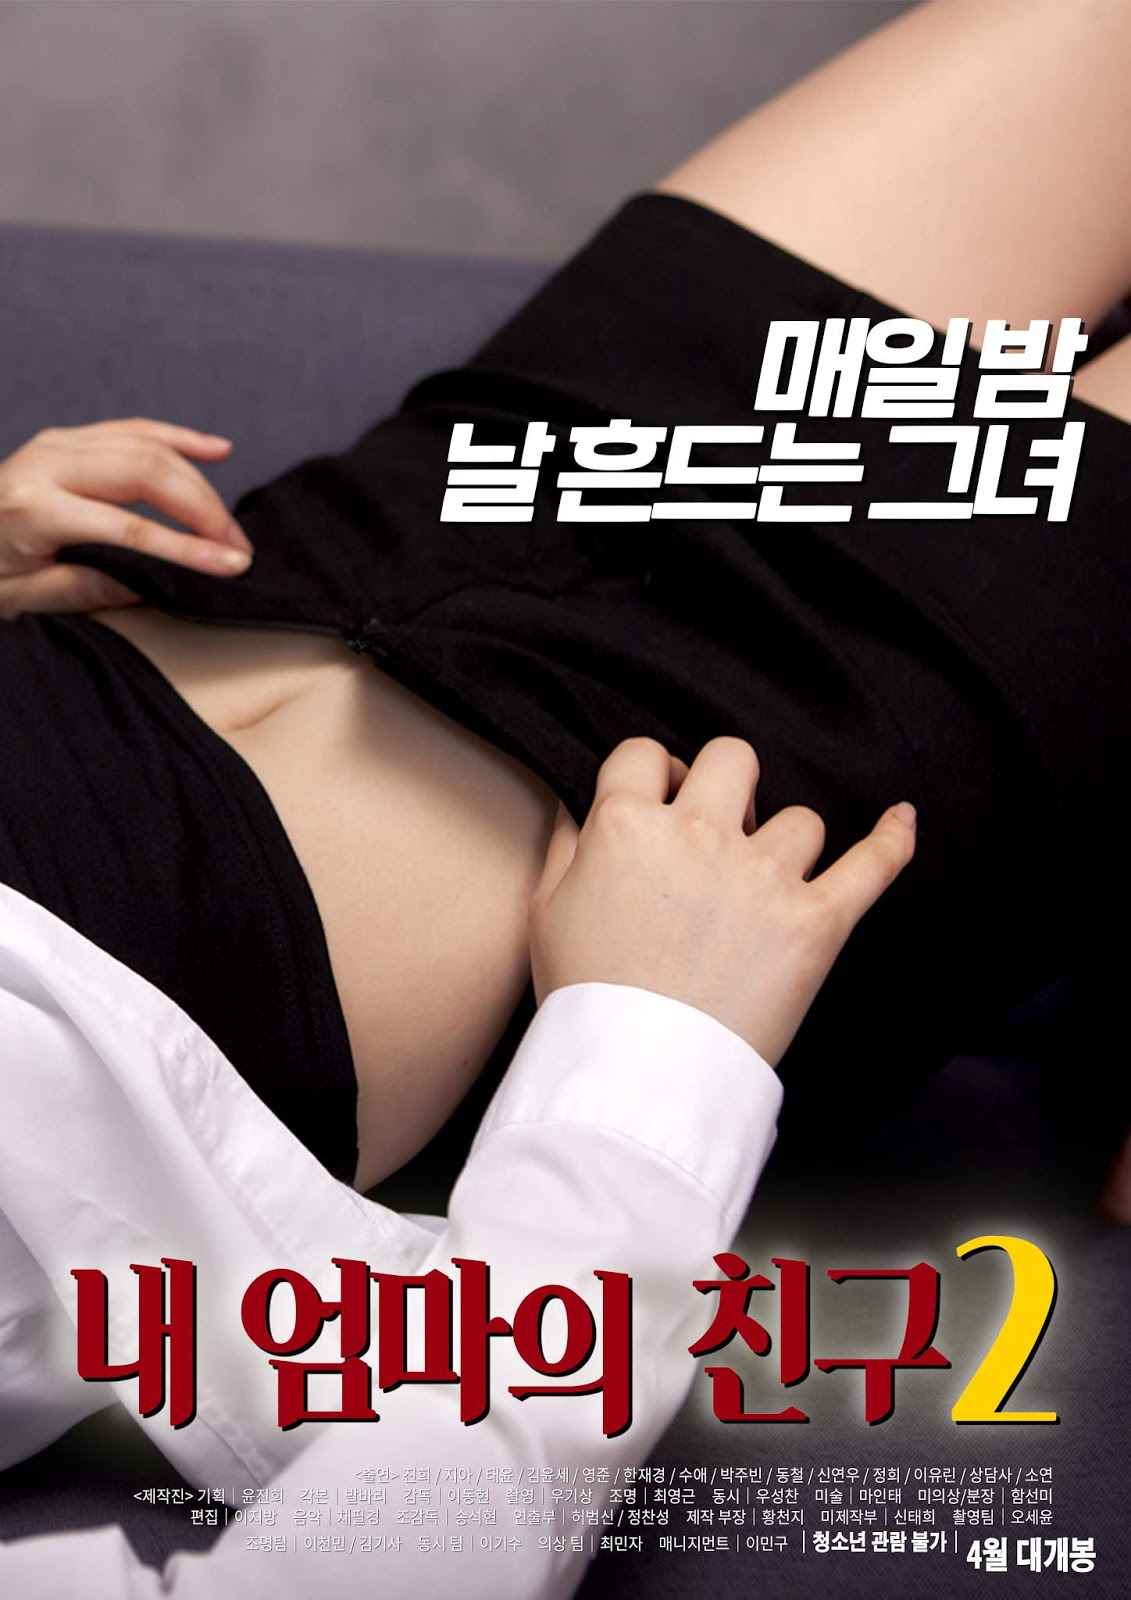 My Mother's Friend 2 Full Korea Adult 18+ Movie Online Nae Eommaui Chingù